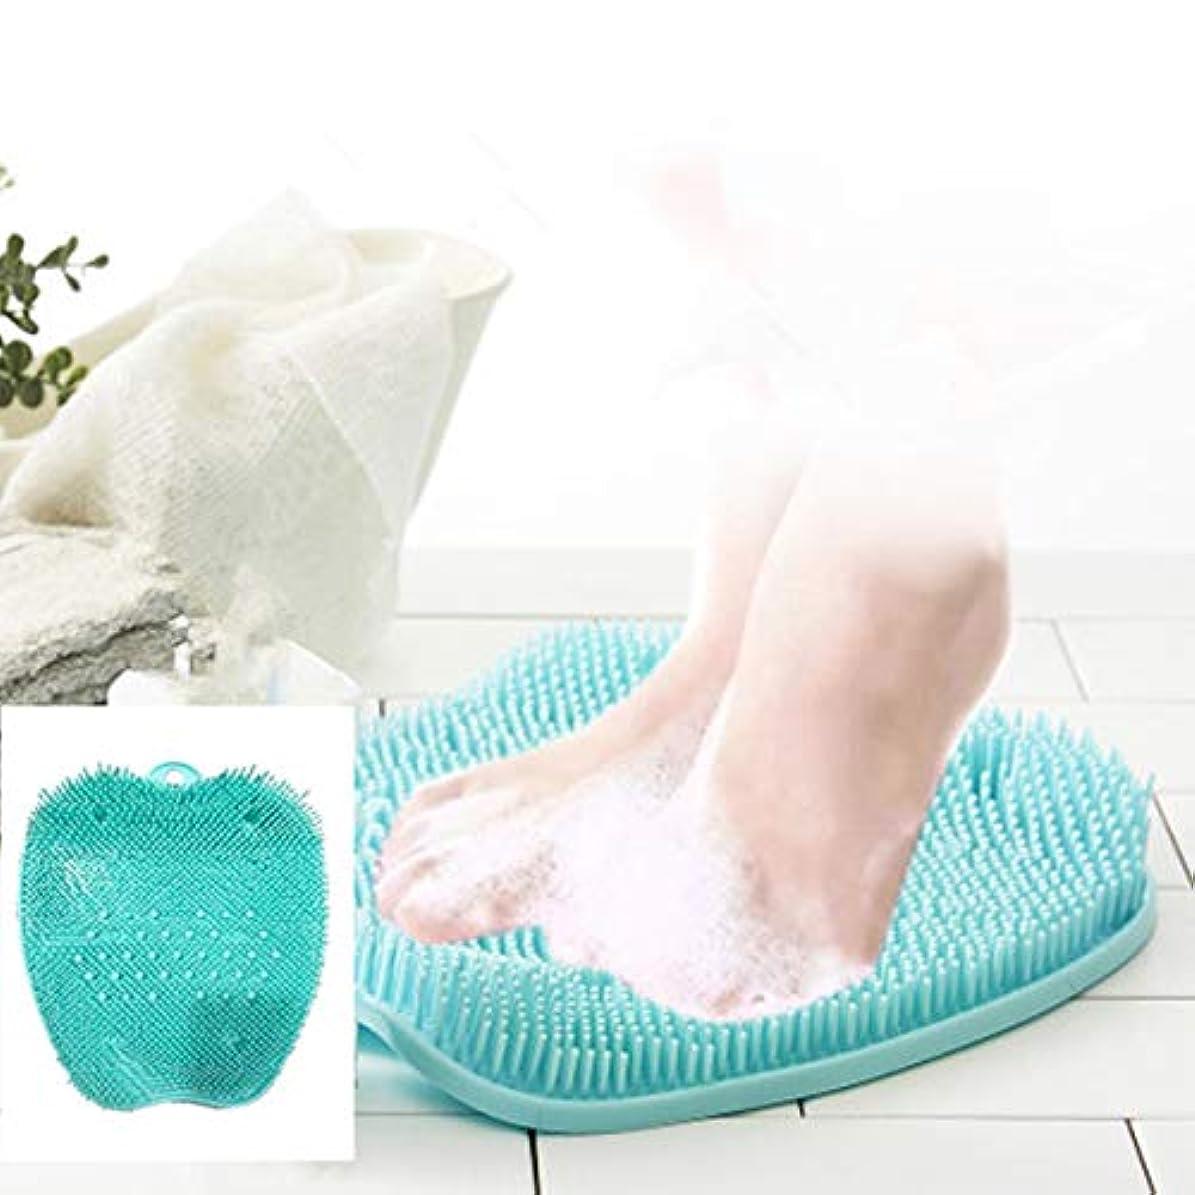 ROOFTOPS フットブラシ 足洗い 足洗いマット滑らない吸盤付き 消化 足裏ブラシ 足臭い 角質ケア フットケアブラシ 角質 臭い 防止 足裏マッサージ